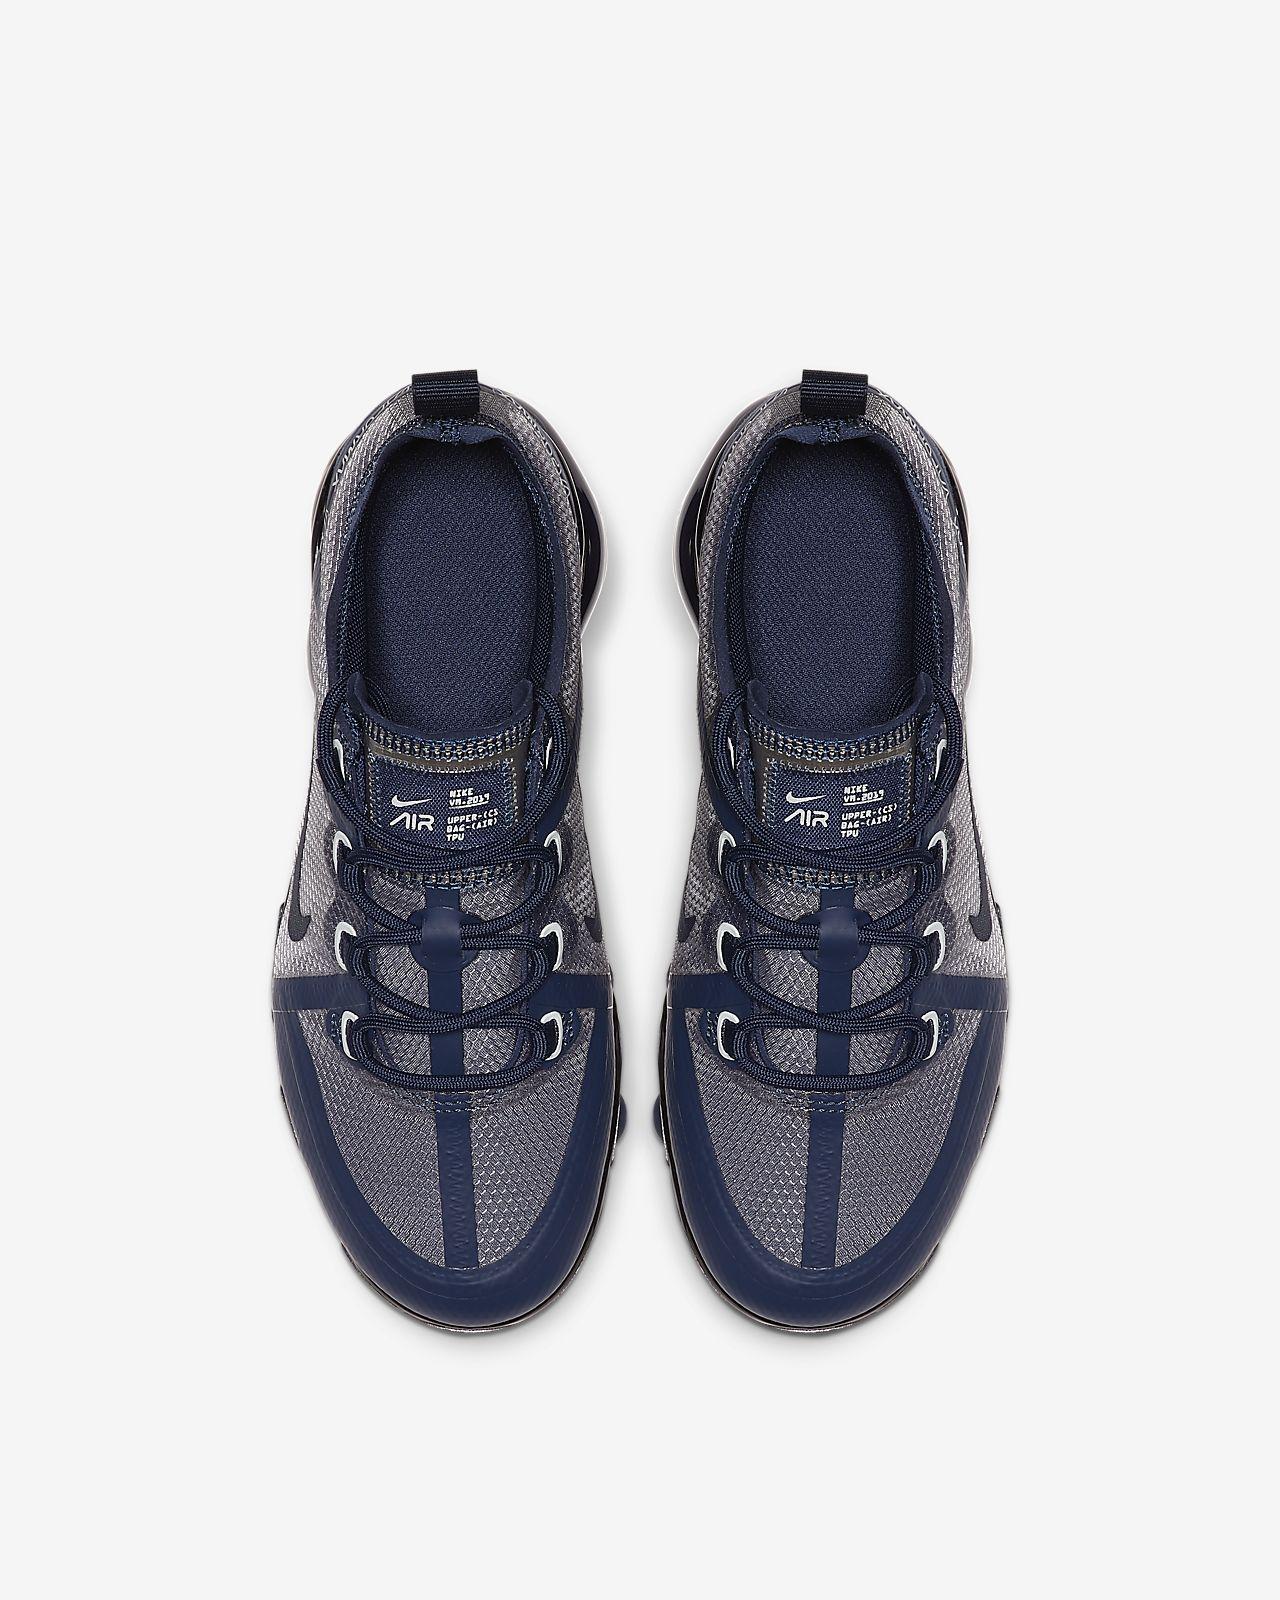 dcdaa52a4d19 Nike Air VaporMax 2019 Older Kids  Shoe. Nike.com GB